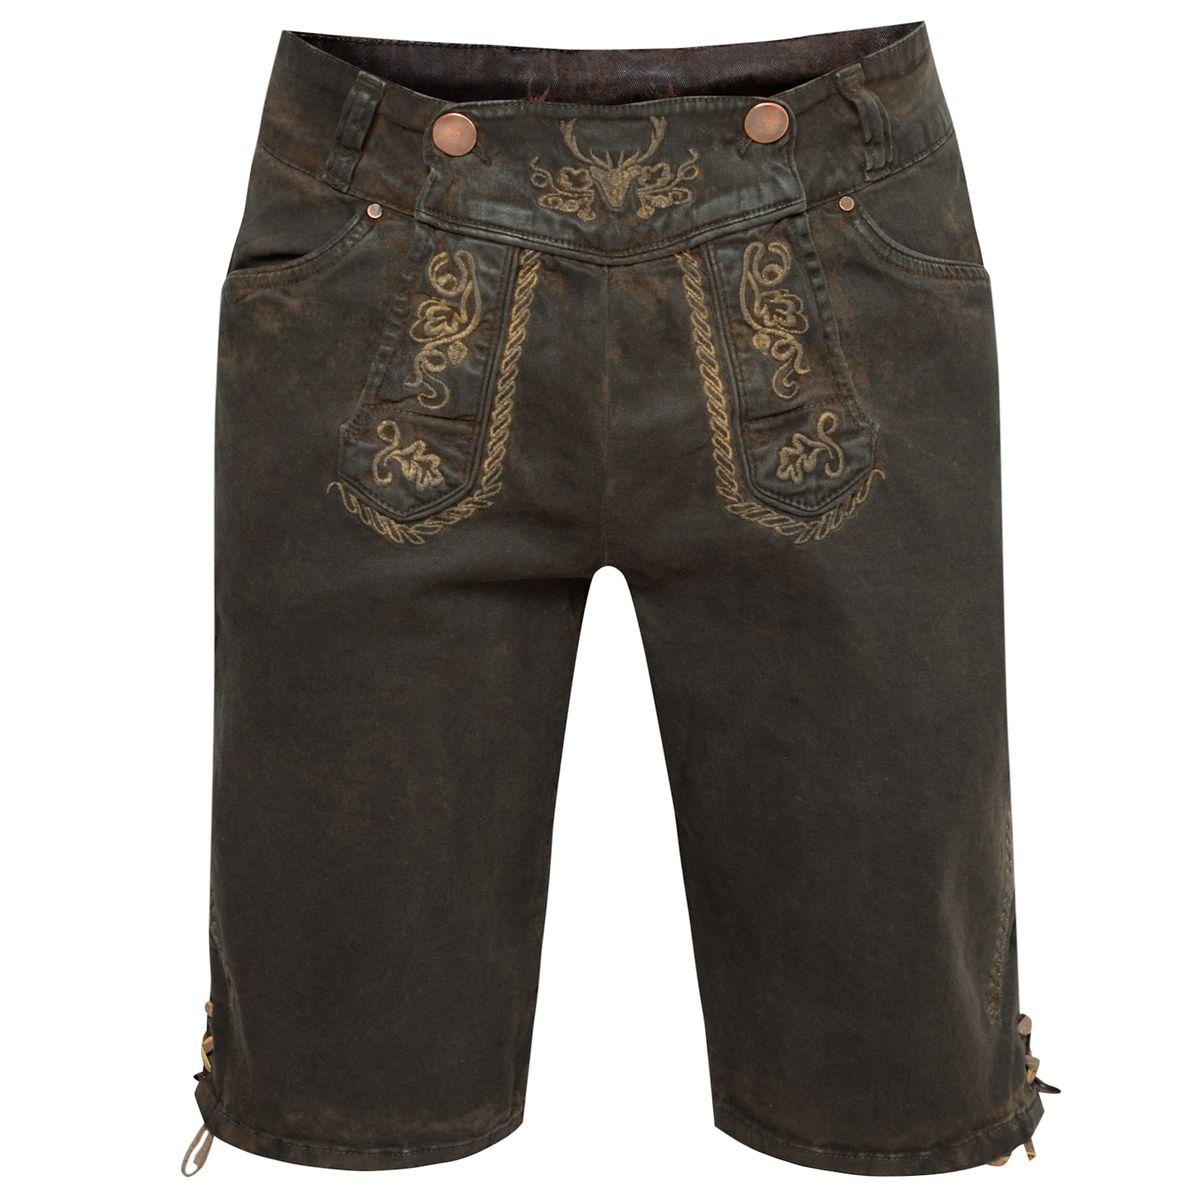 Jeans-Lederhose Martin in Dunkelbraun von Hangowear